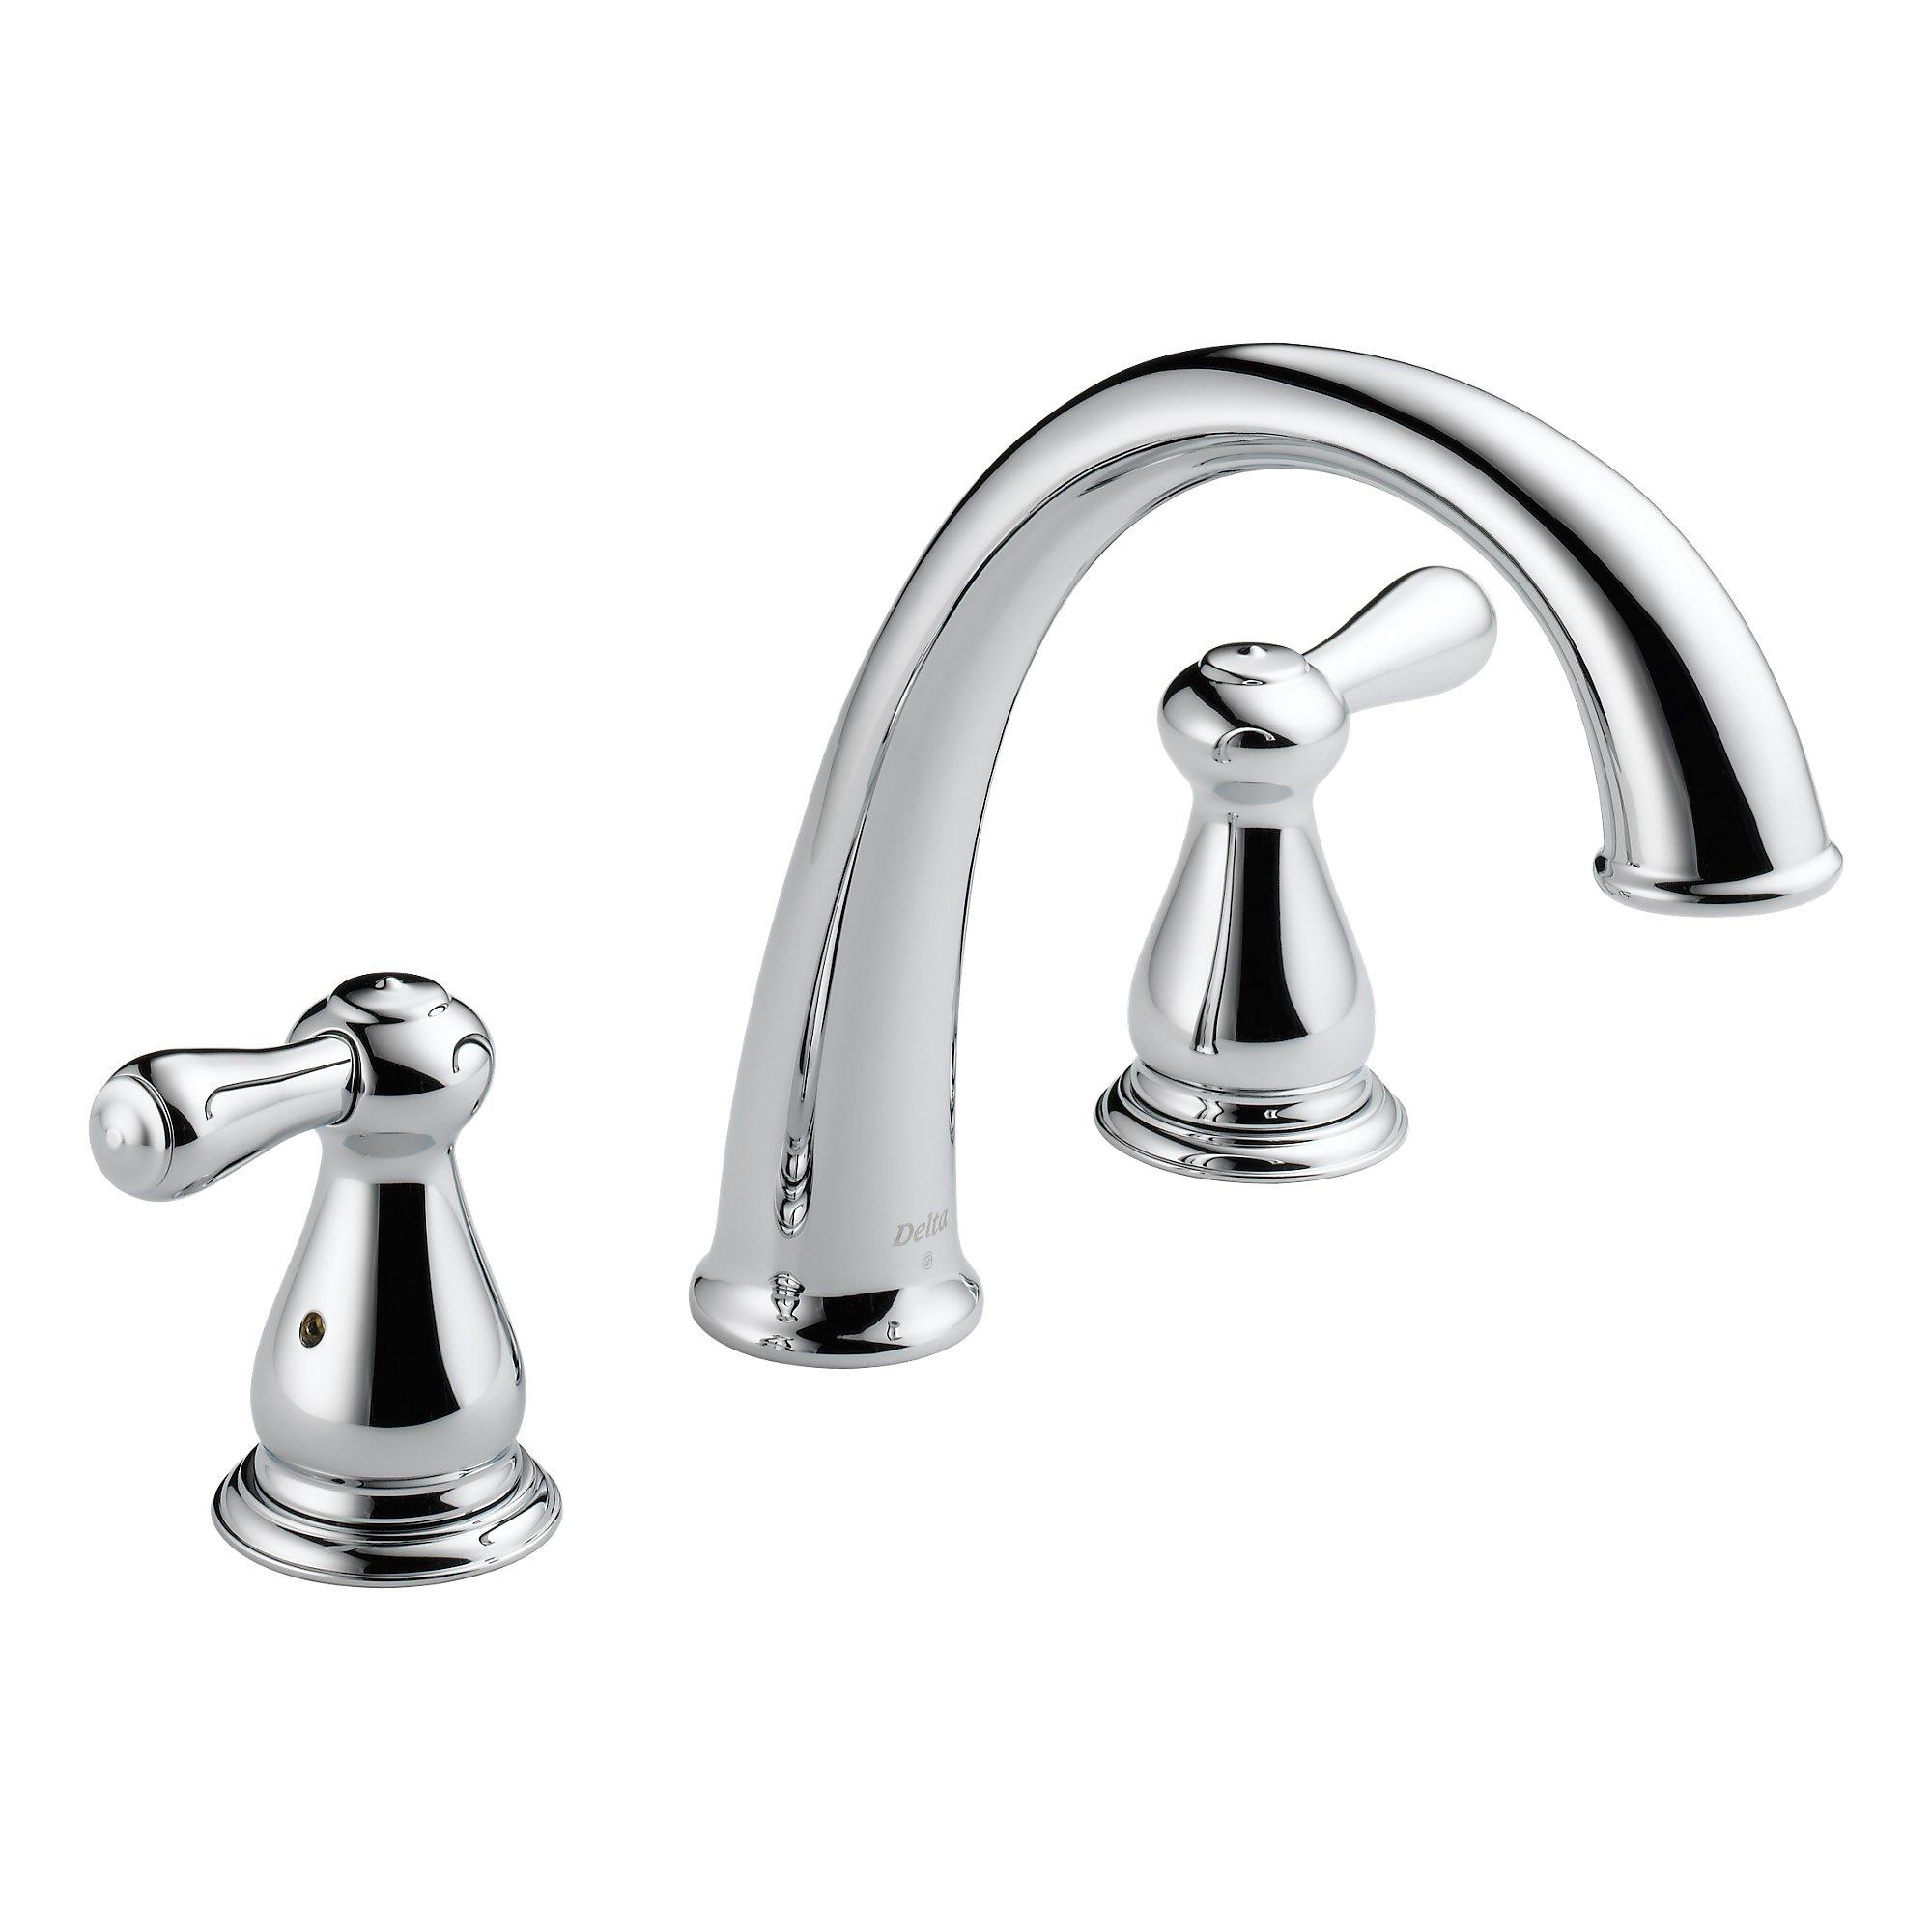 Delta Faucets Roman Two Handle Bathroom Tub Faucet Trim